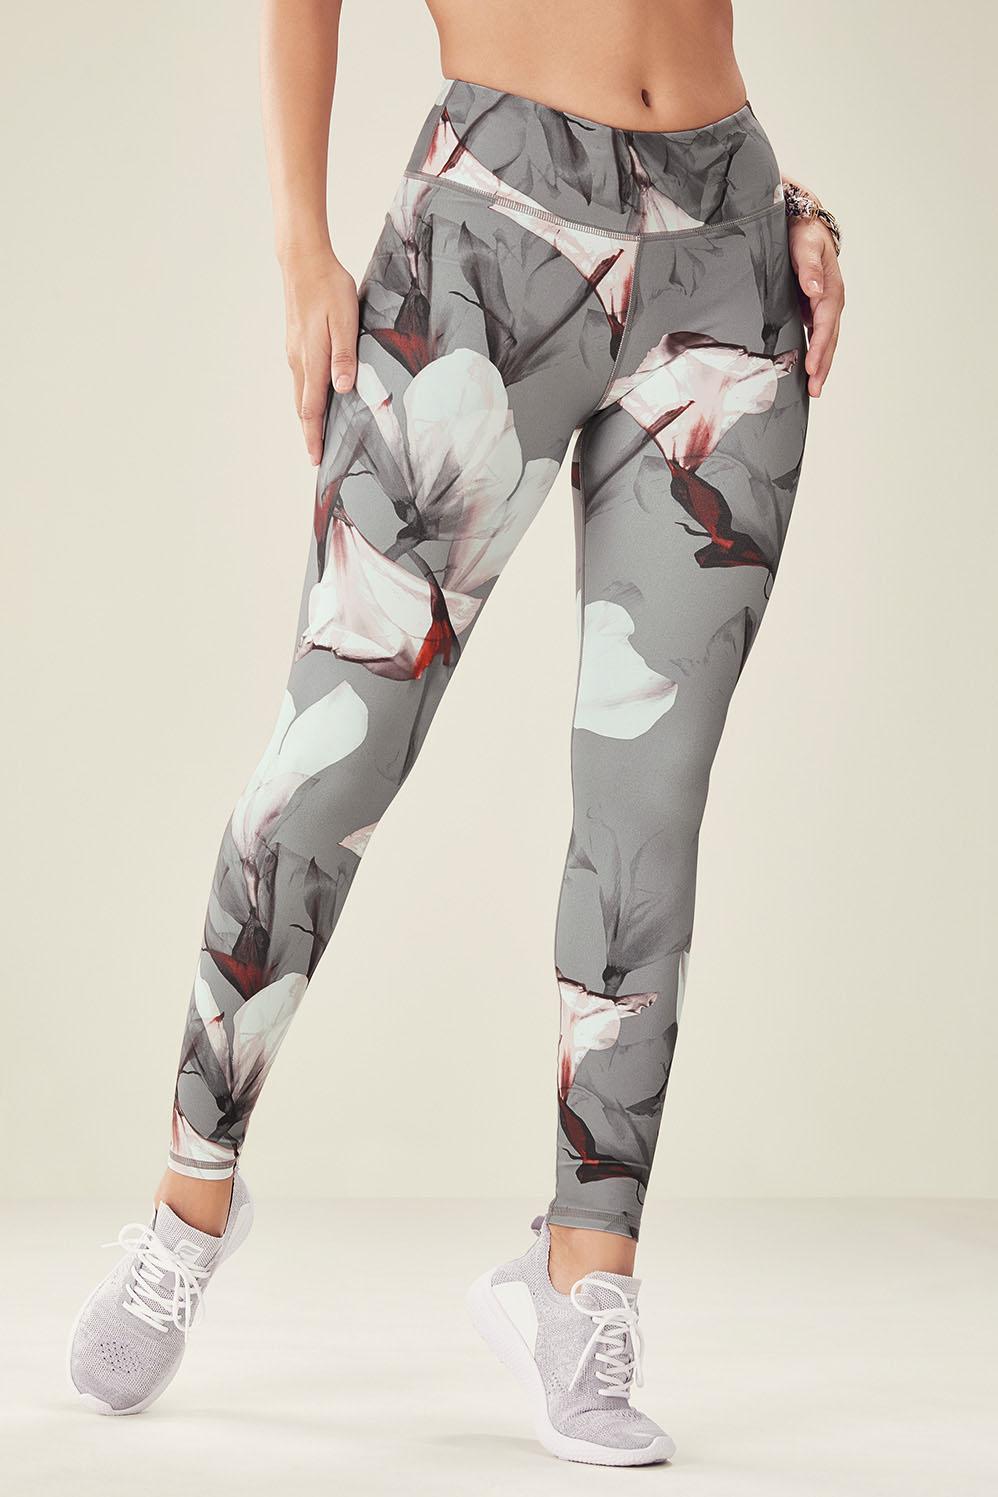 986e0c0c64d Salar Printed PowerHold® Legging - mirage print